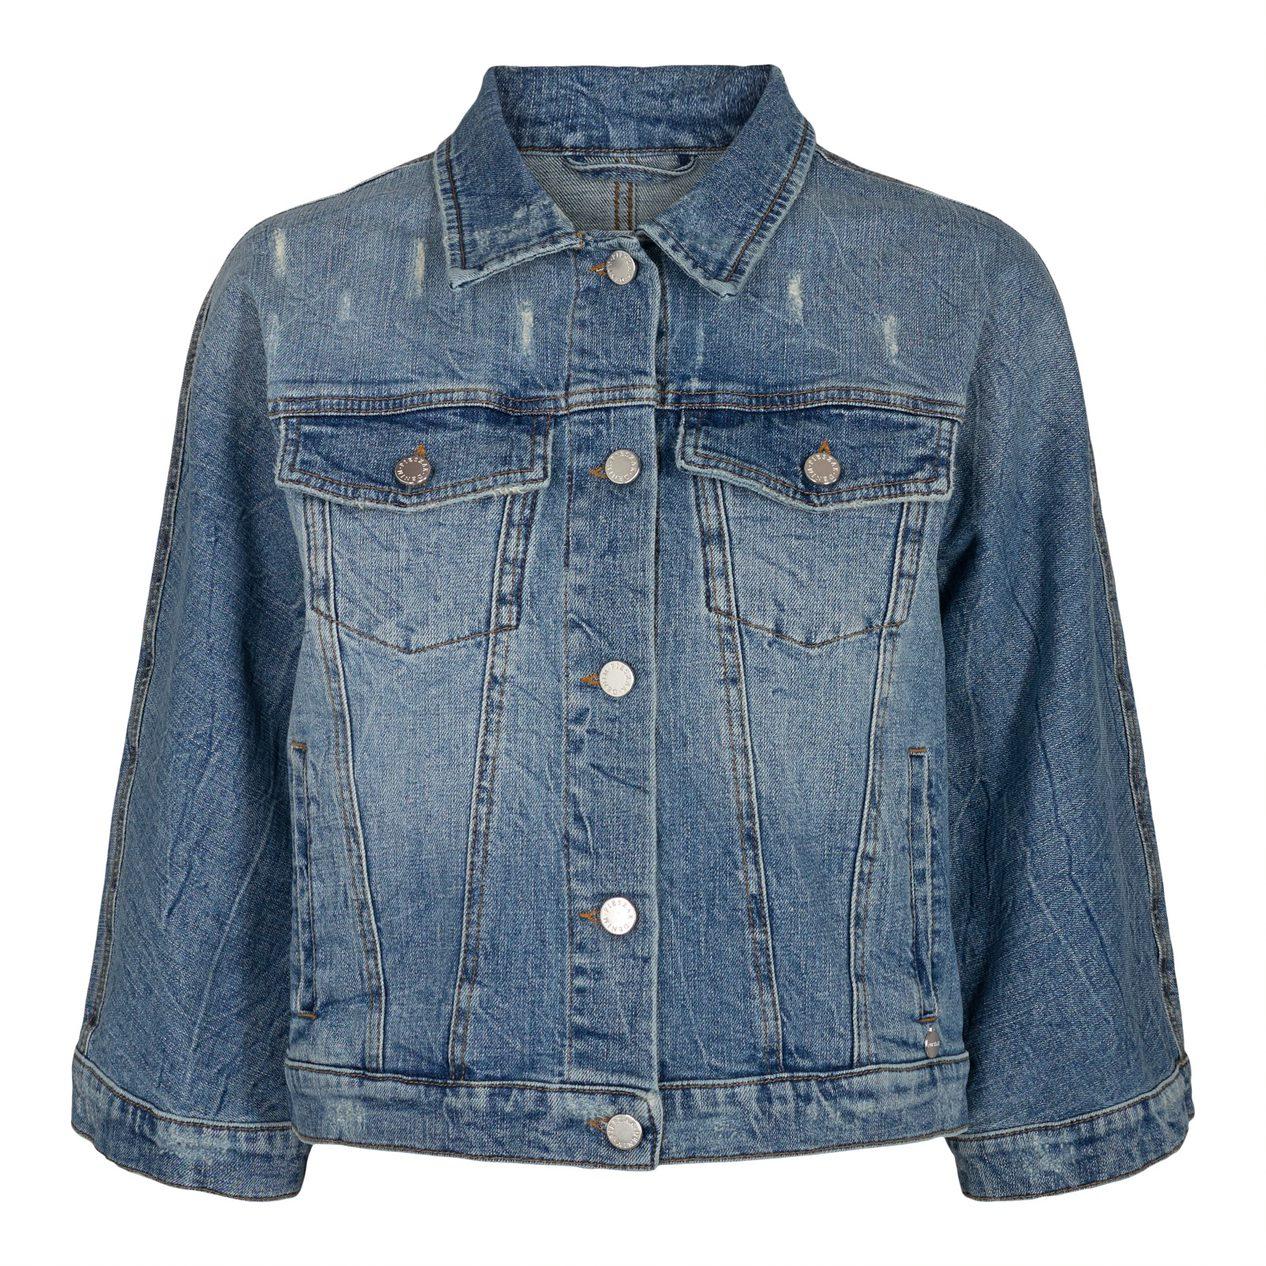 Poline 3/4 Denim Jacket